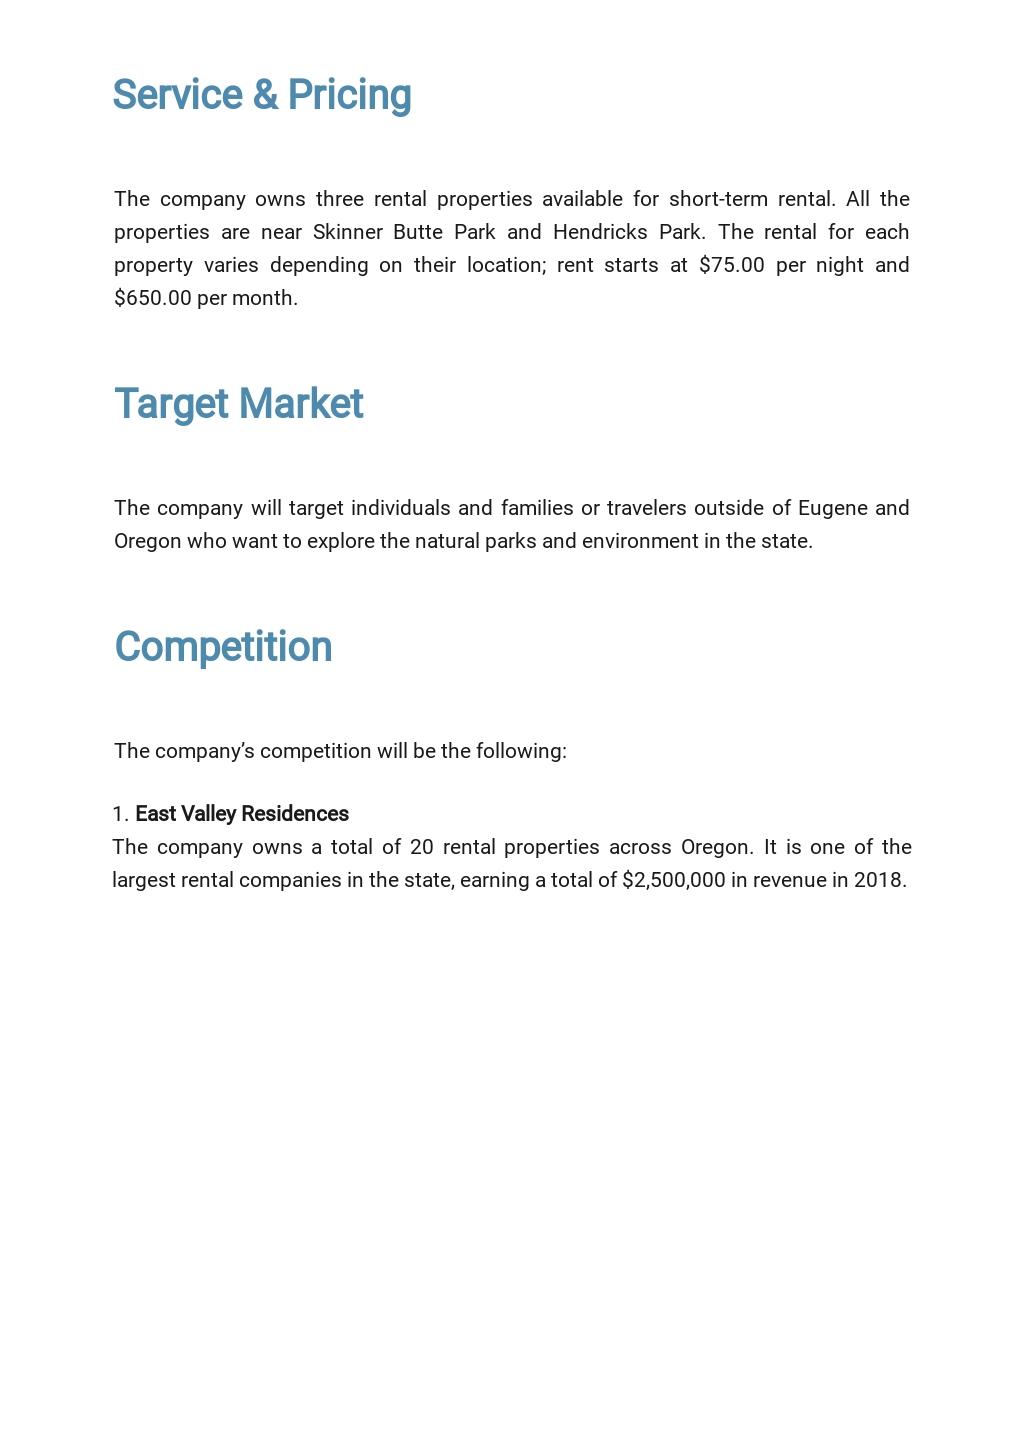 Rental Property Business Plan Template  2.jpe